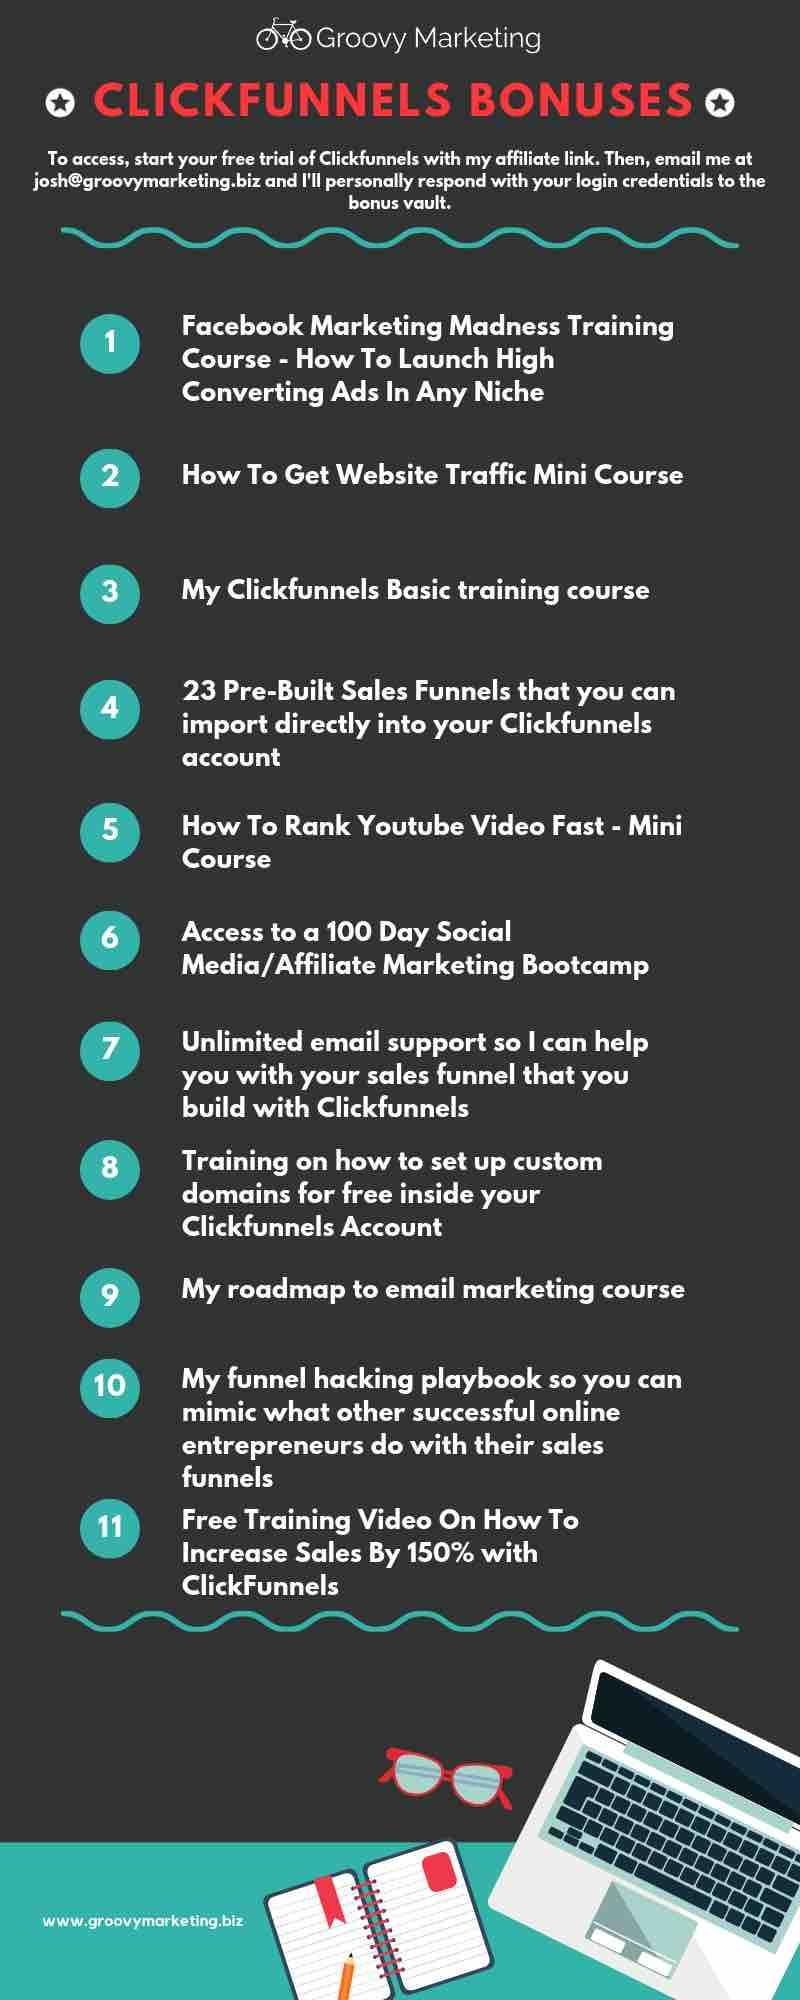 Clickfunnels-pricing-bonuses-infographic3-best-deal-post.jpg